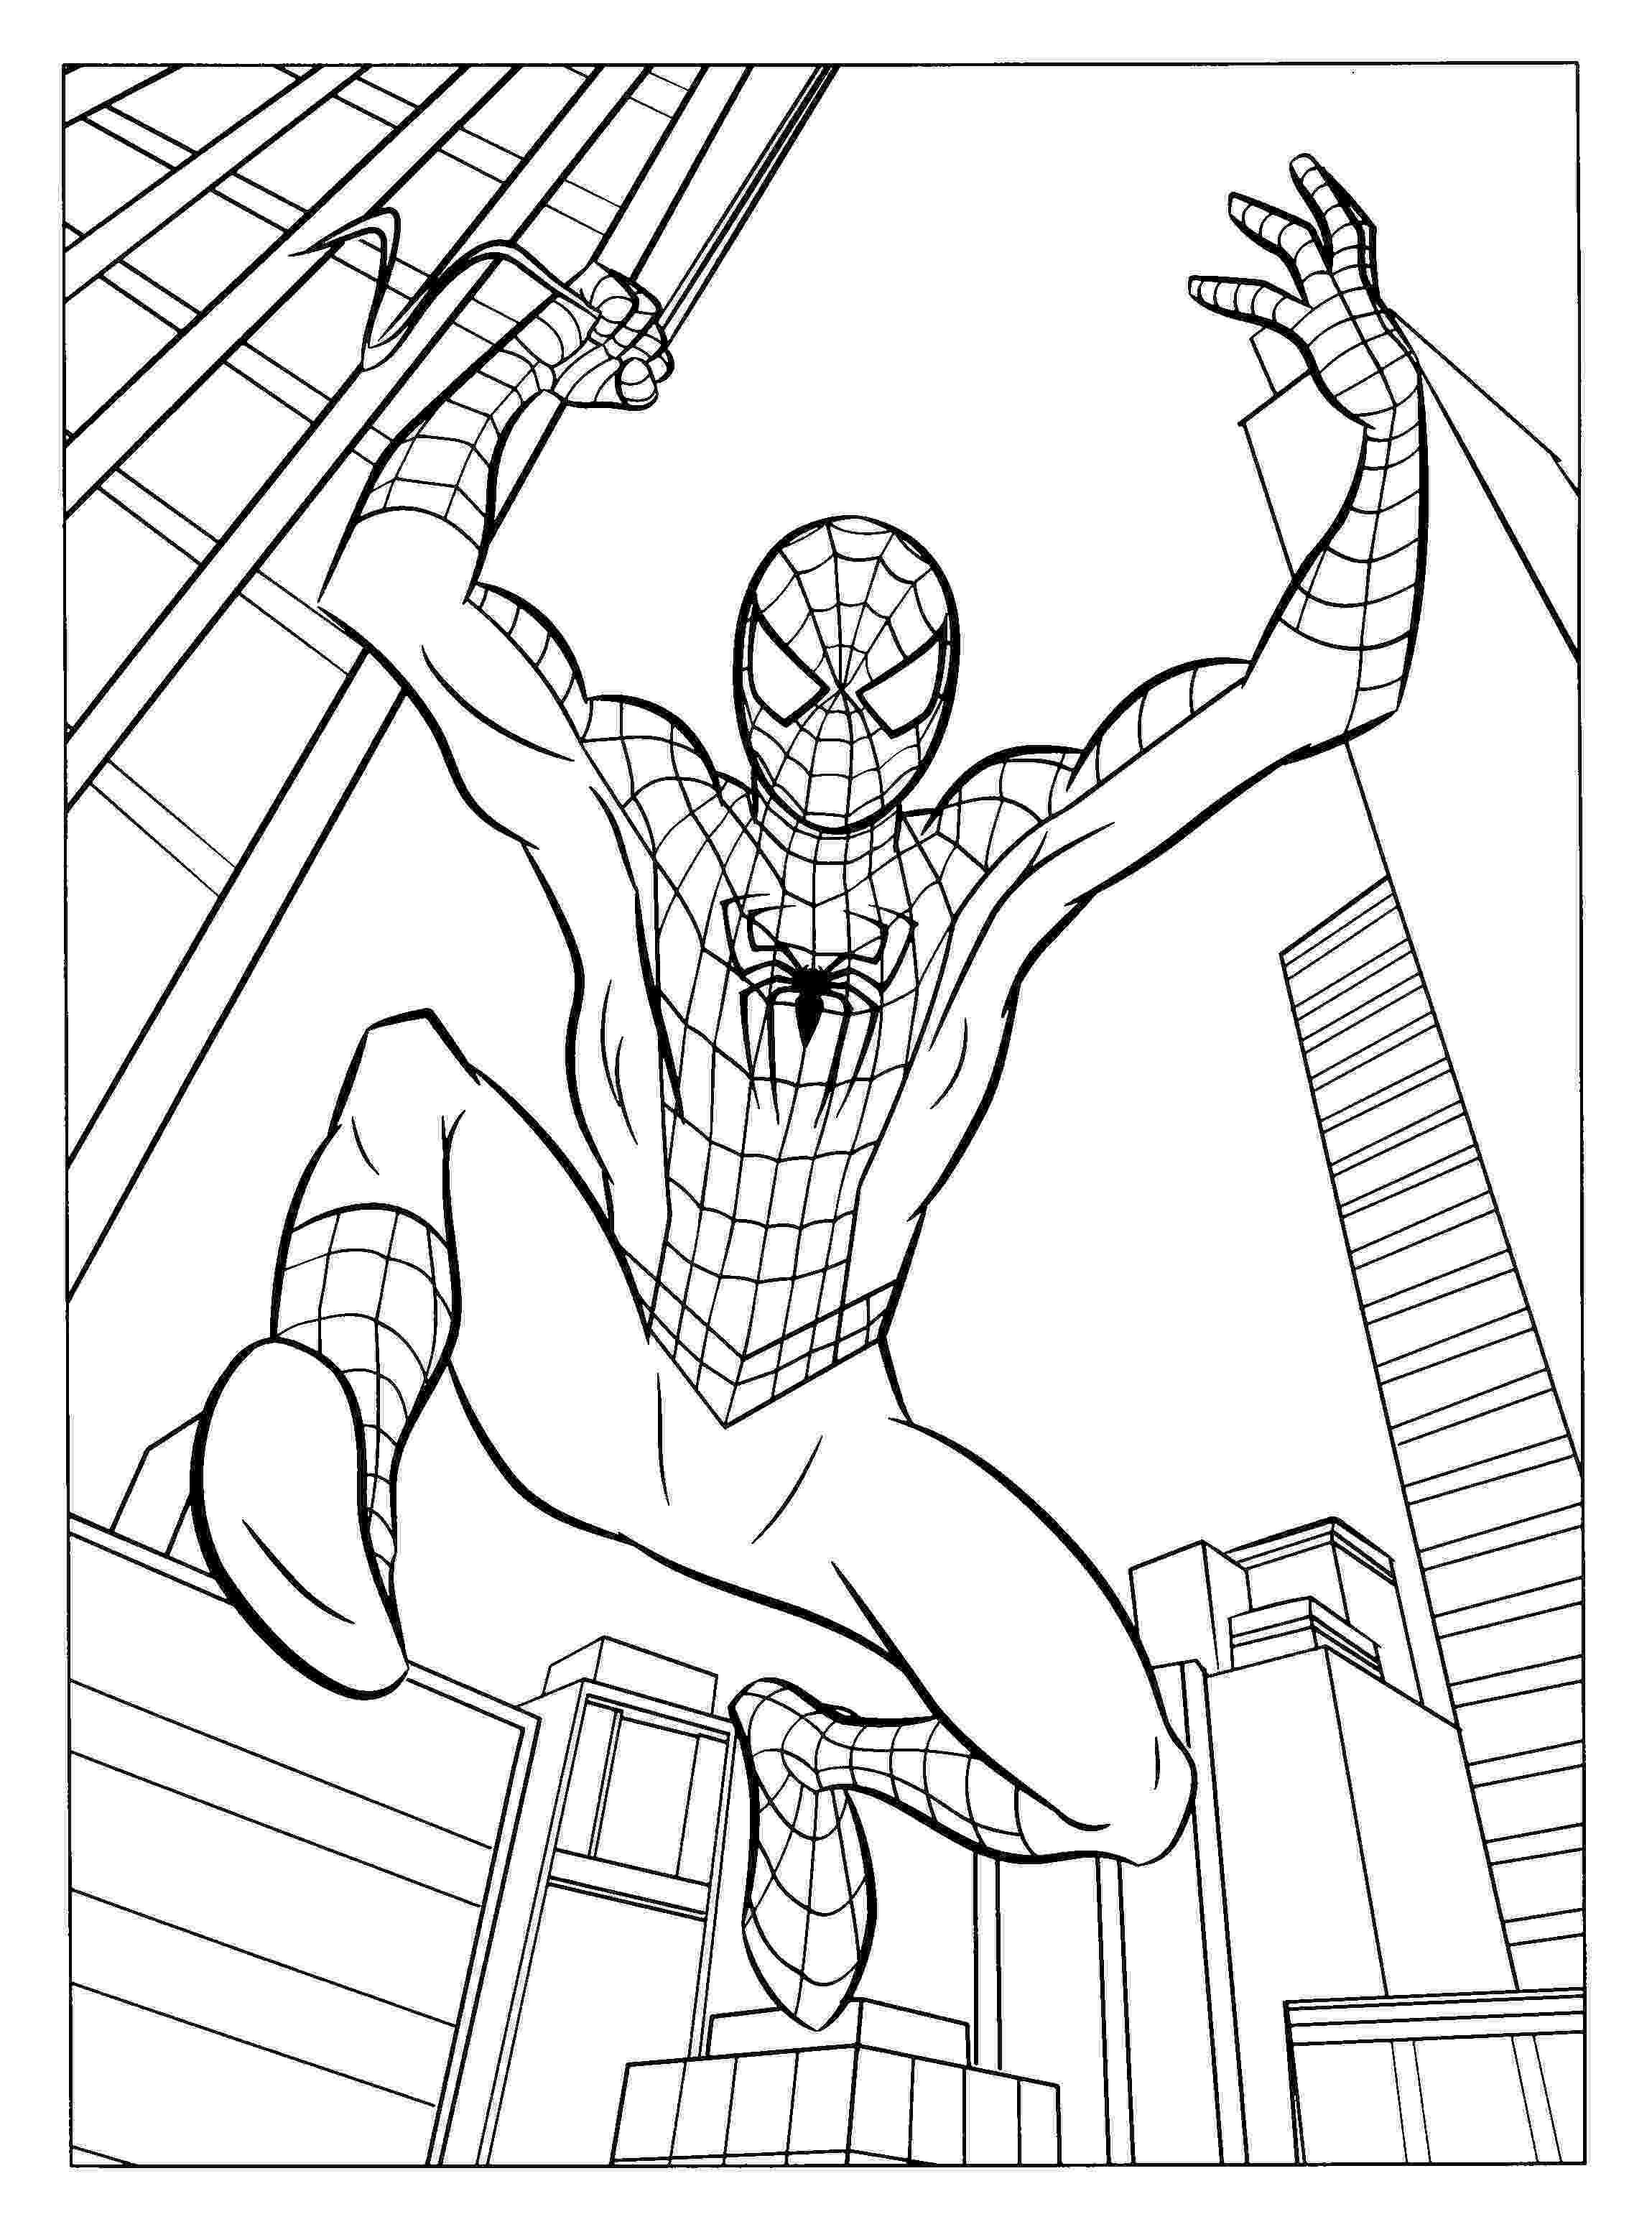 spider man coloring sheet amazing spider man coloring pages coloring pages to spider sheet coloring man